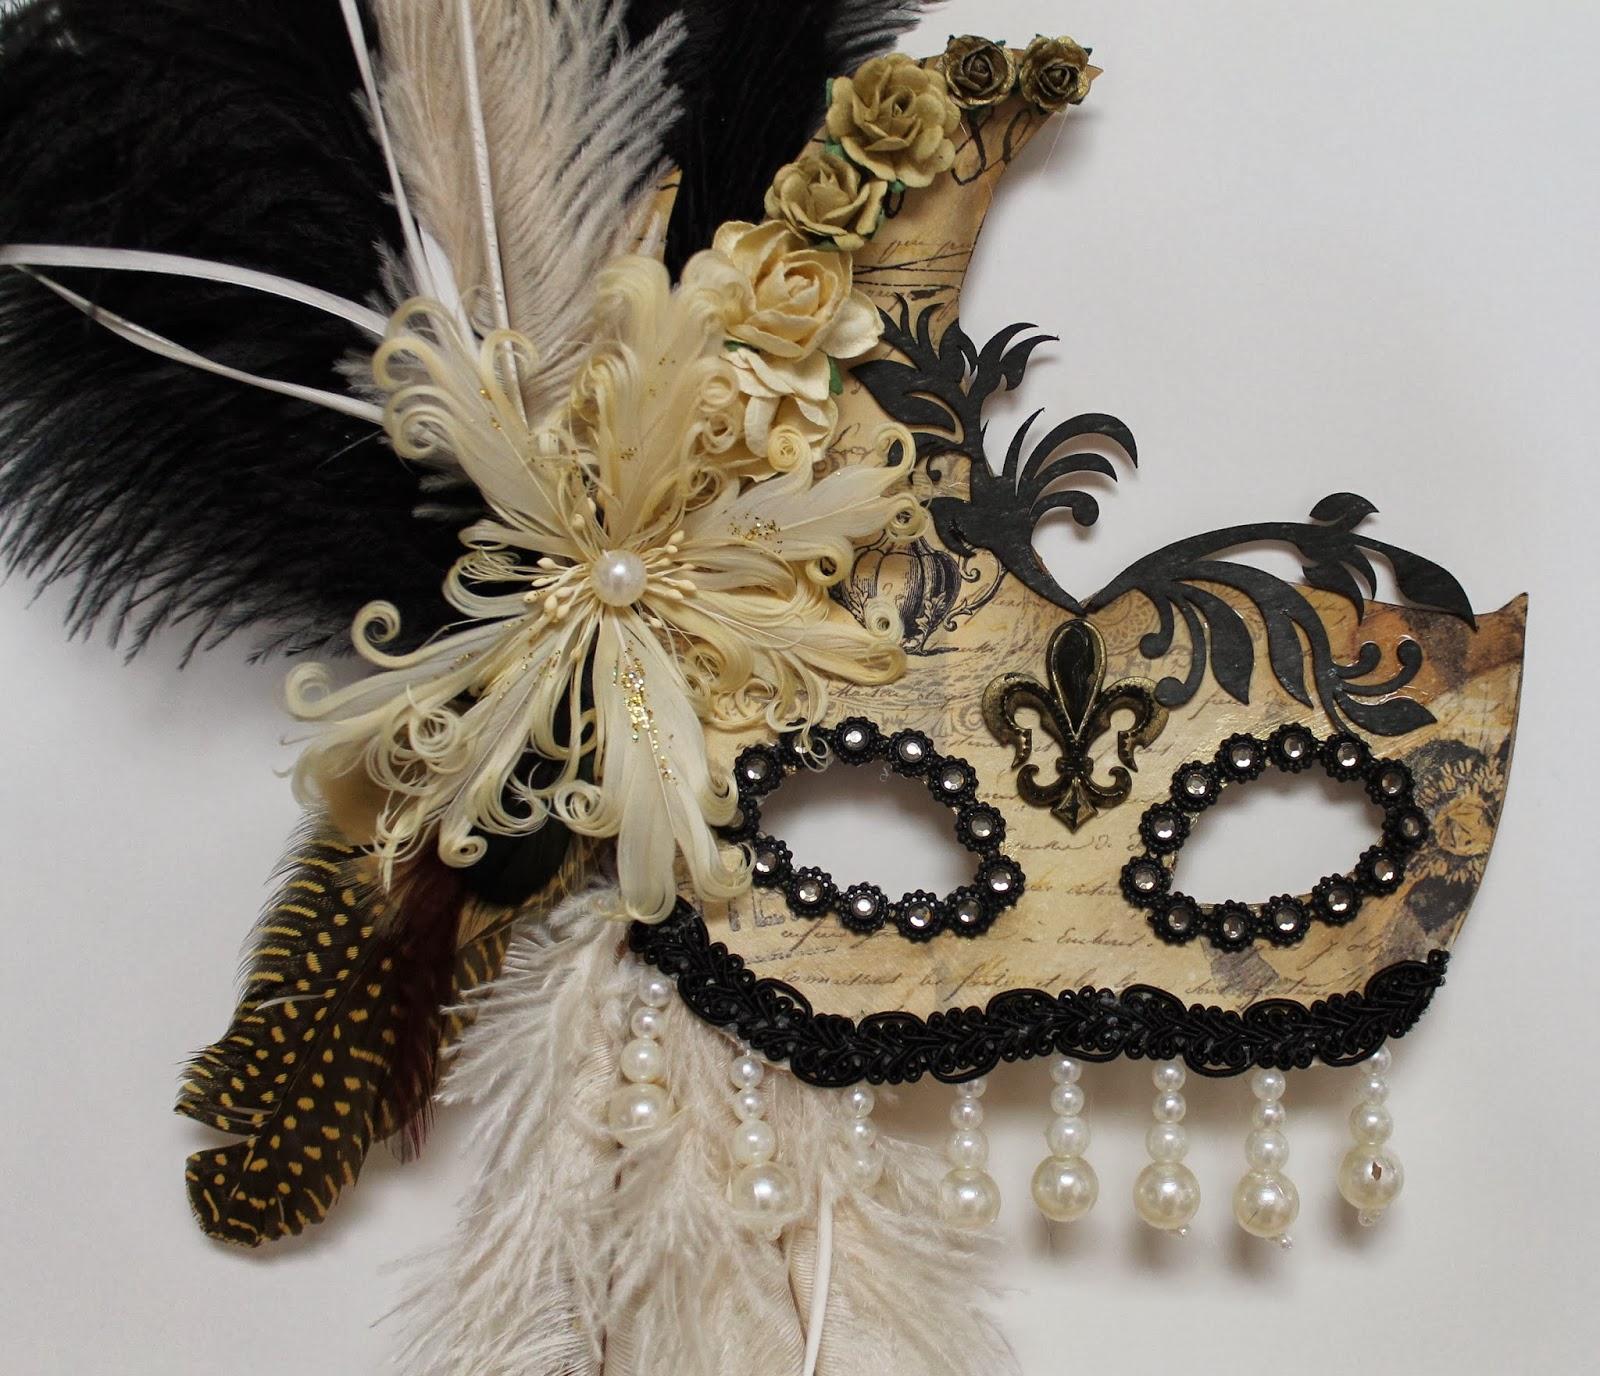 Ginas Designs: Masquerade Mask